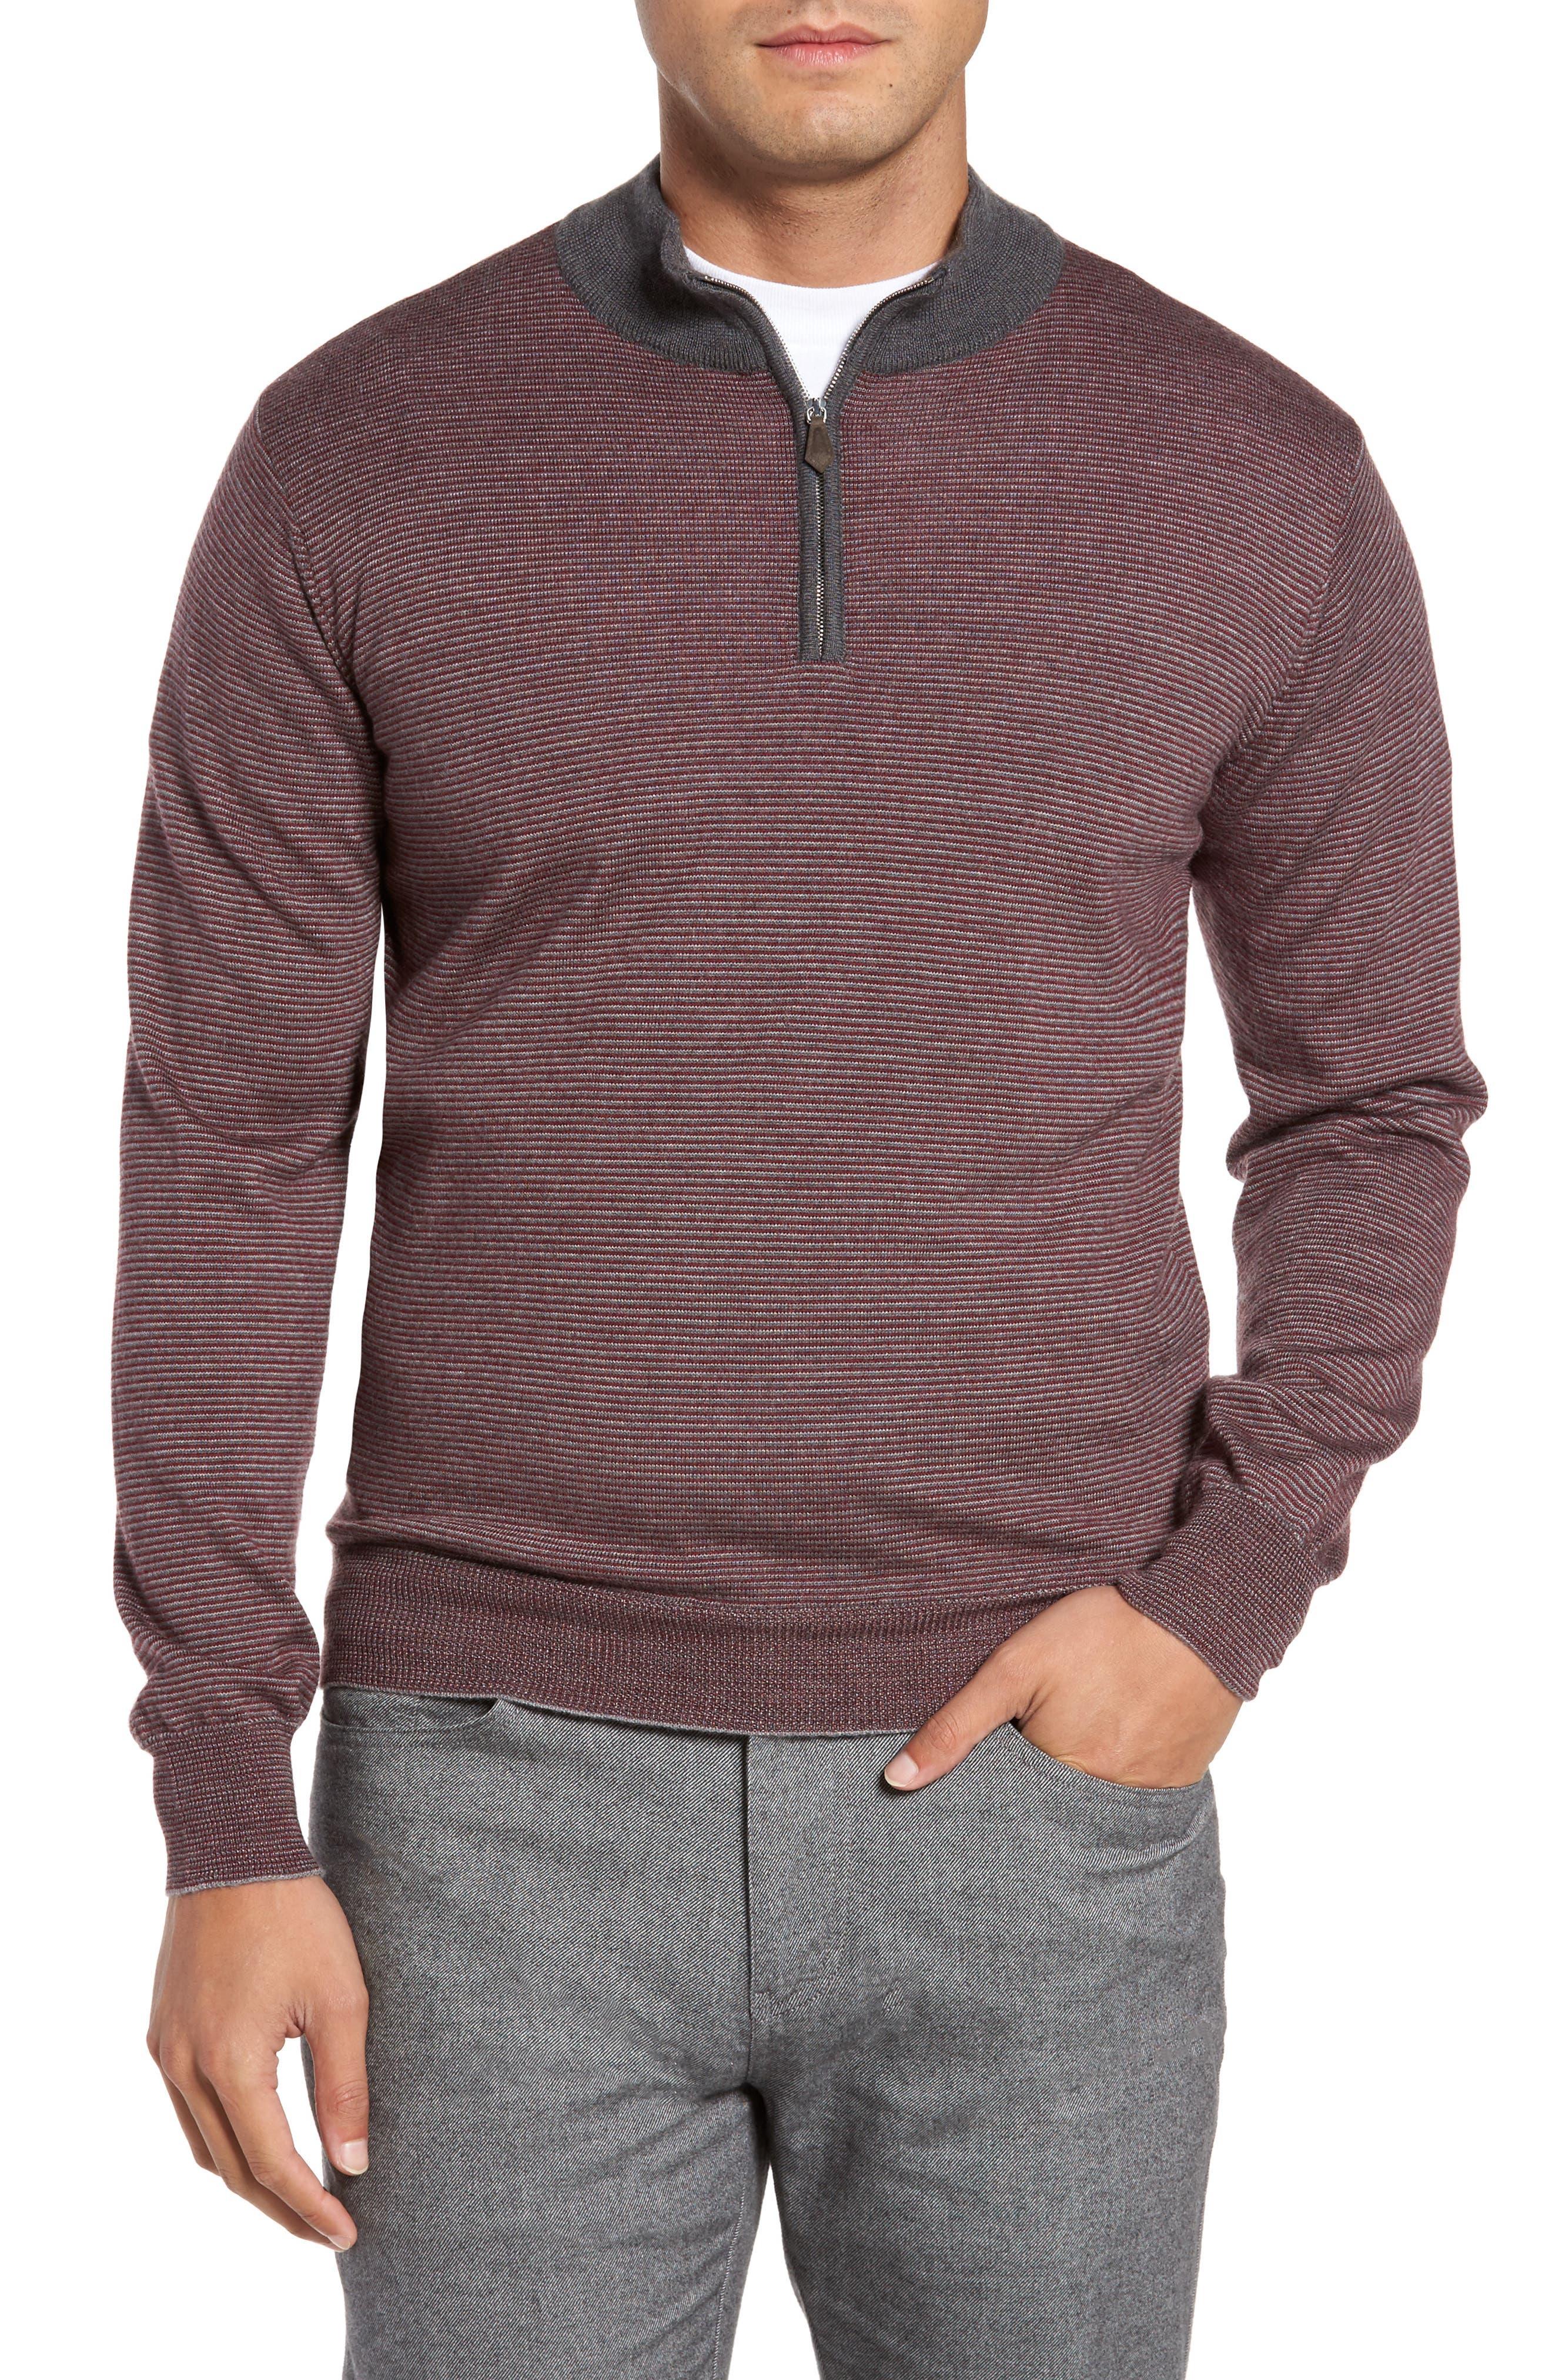 Trichrome Stripe Merino Wool Blend Sweater,                             Main thumbnail 1, color,                             Chianti